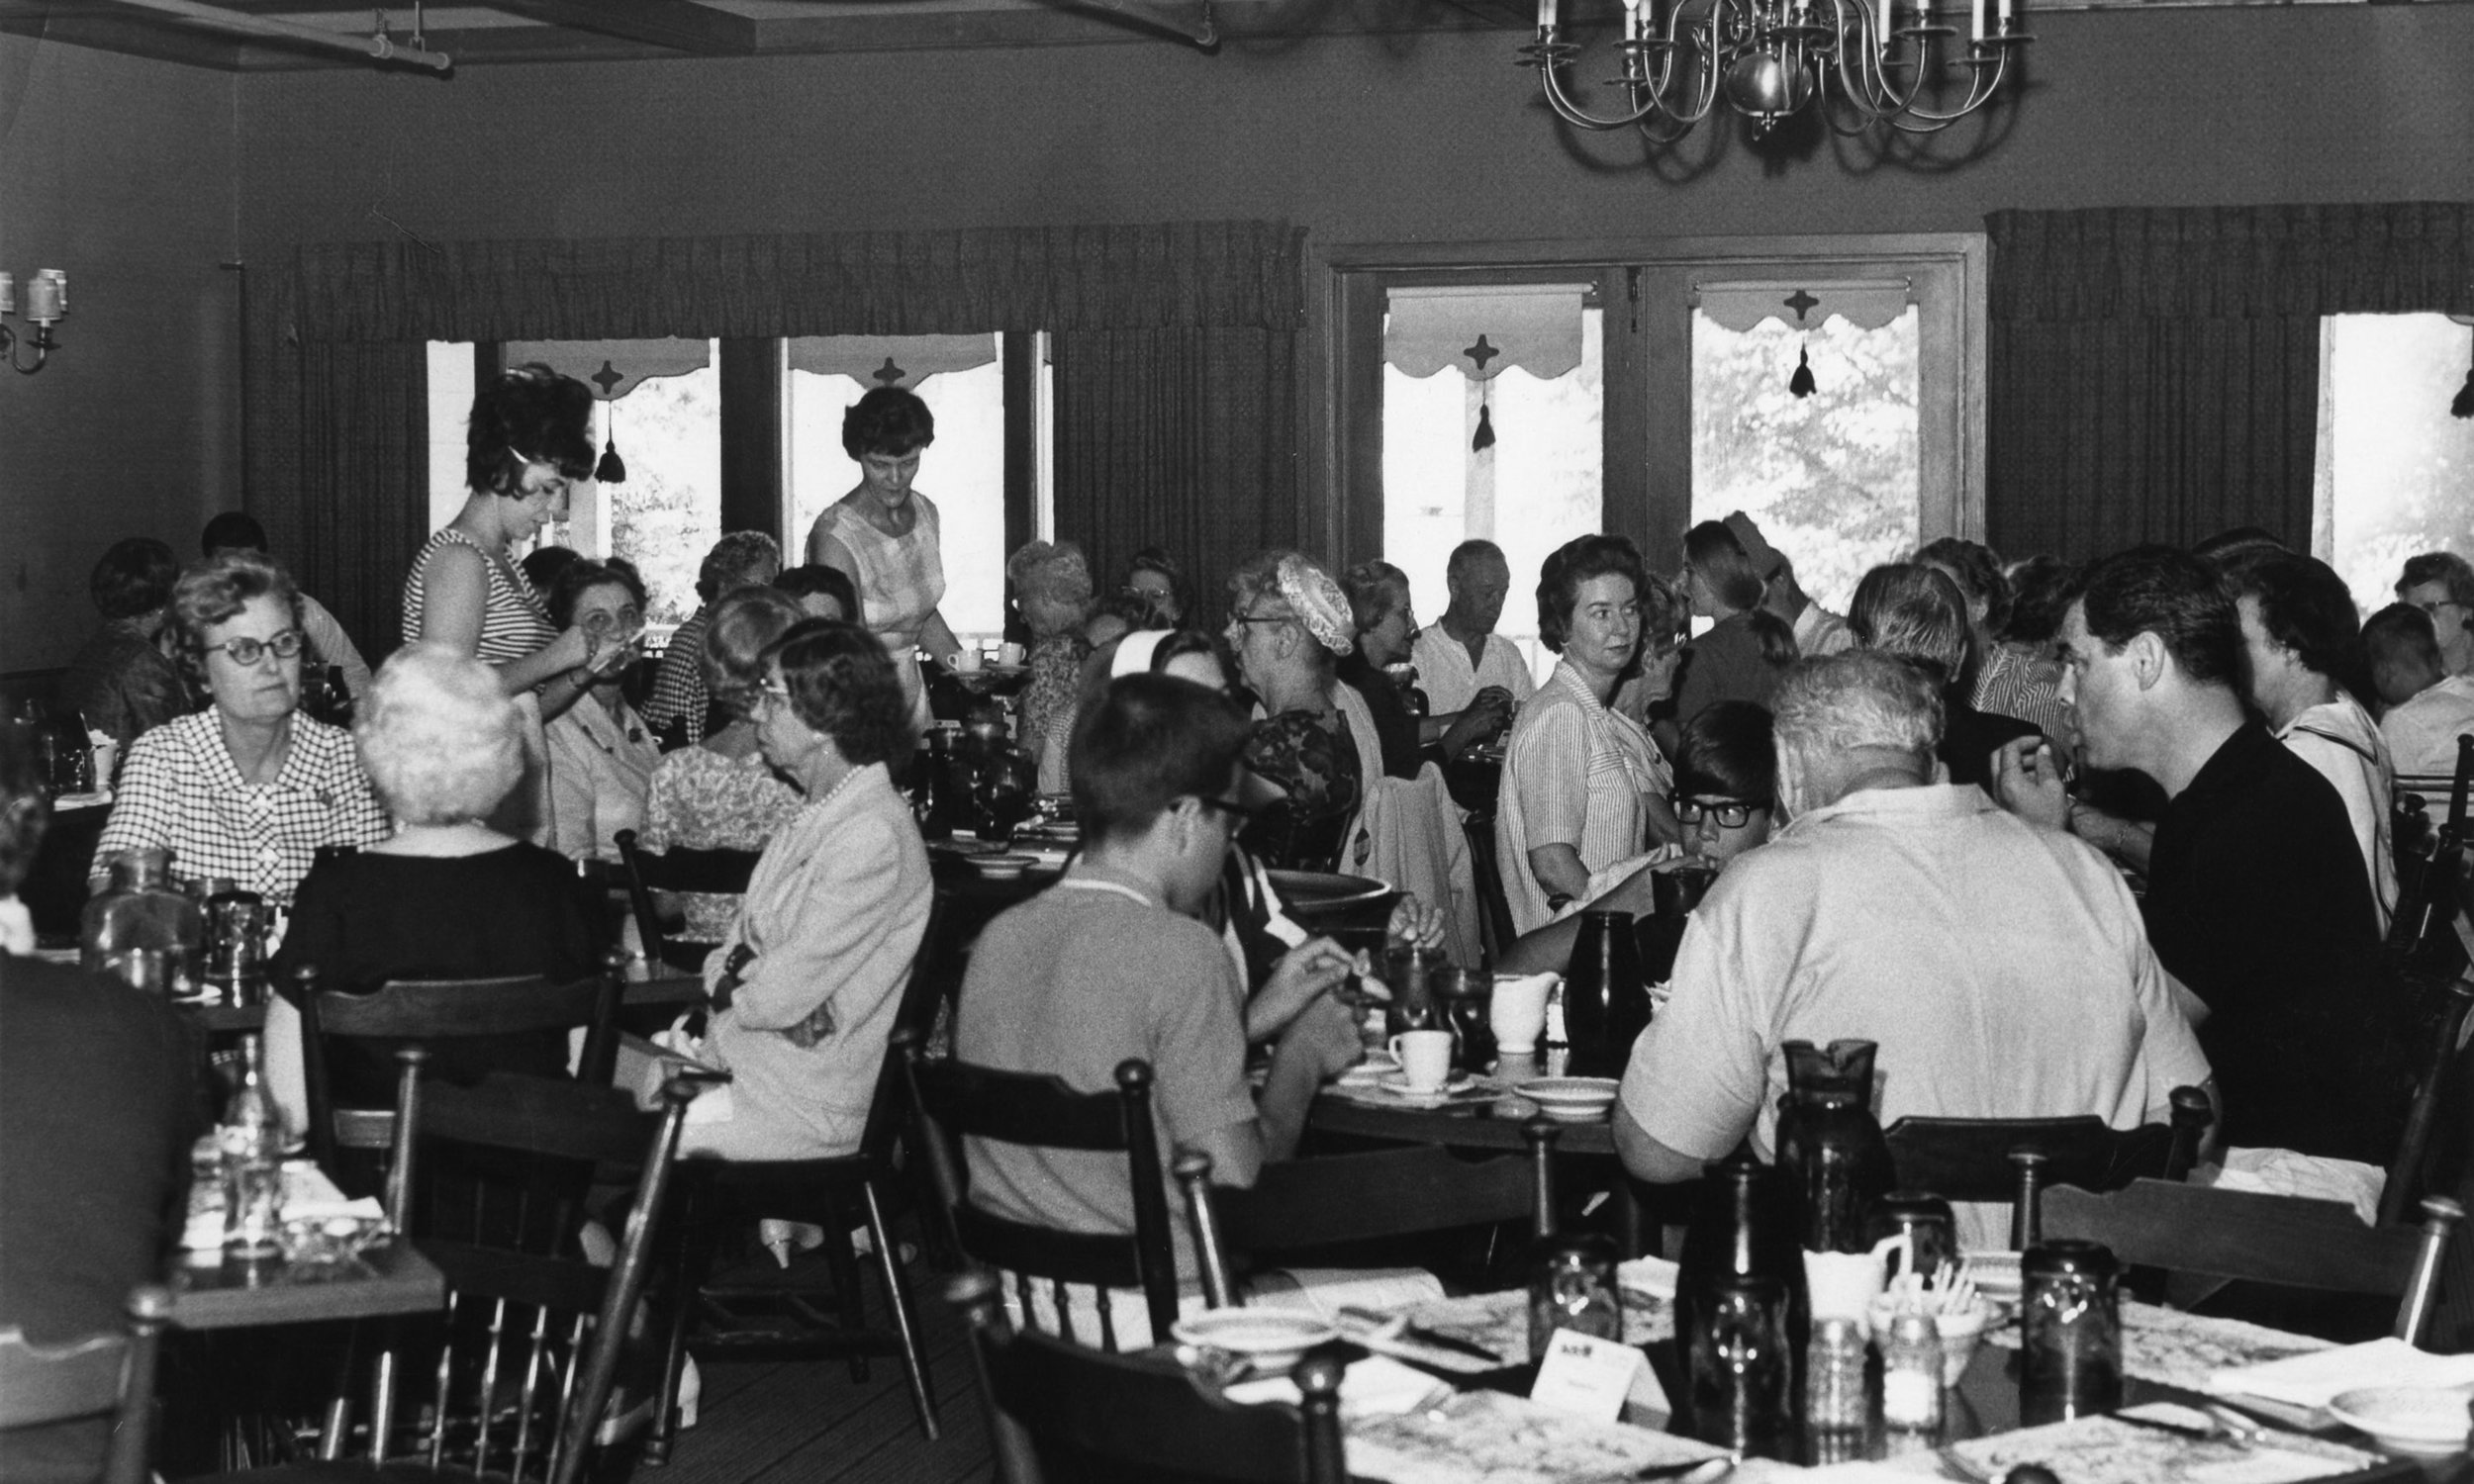 Stagecoach-inn-restaurant-patrons.jpg